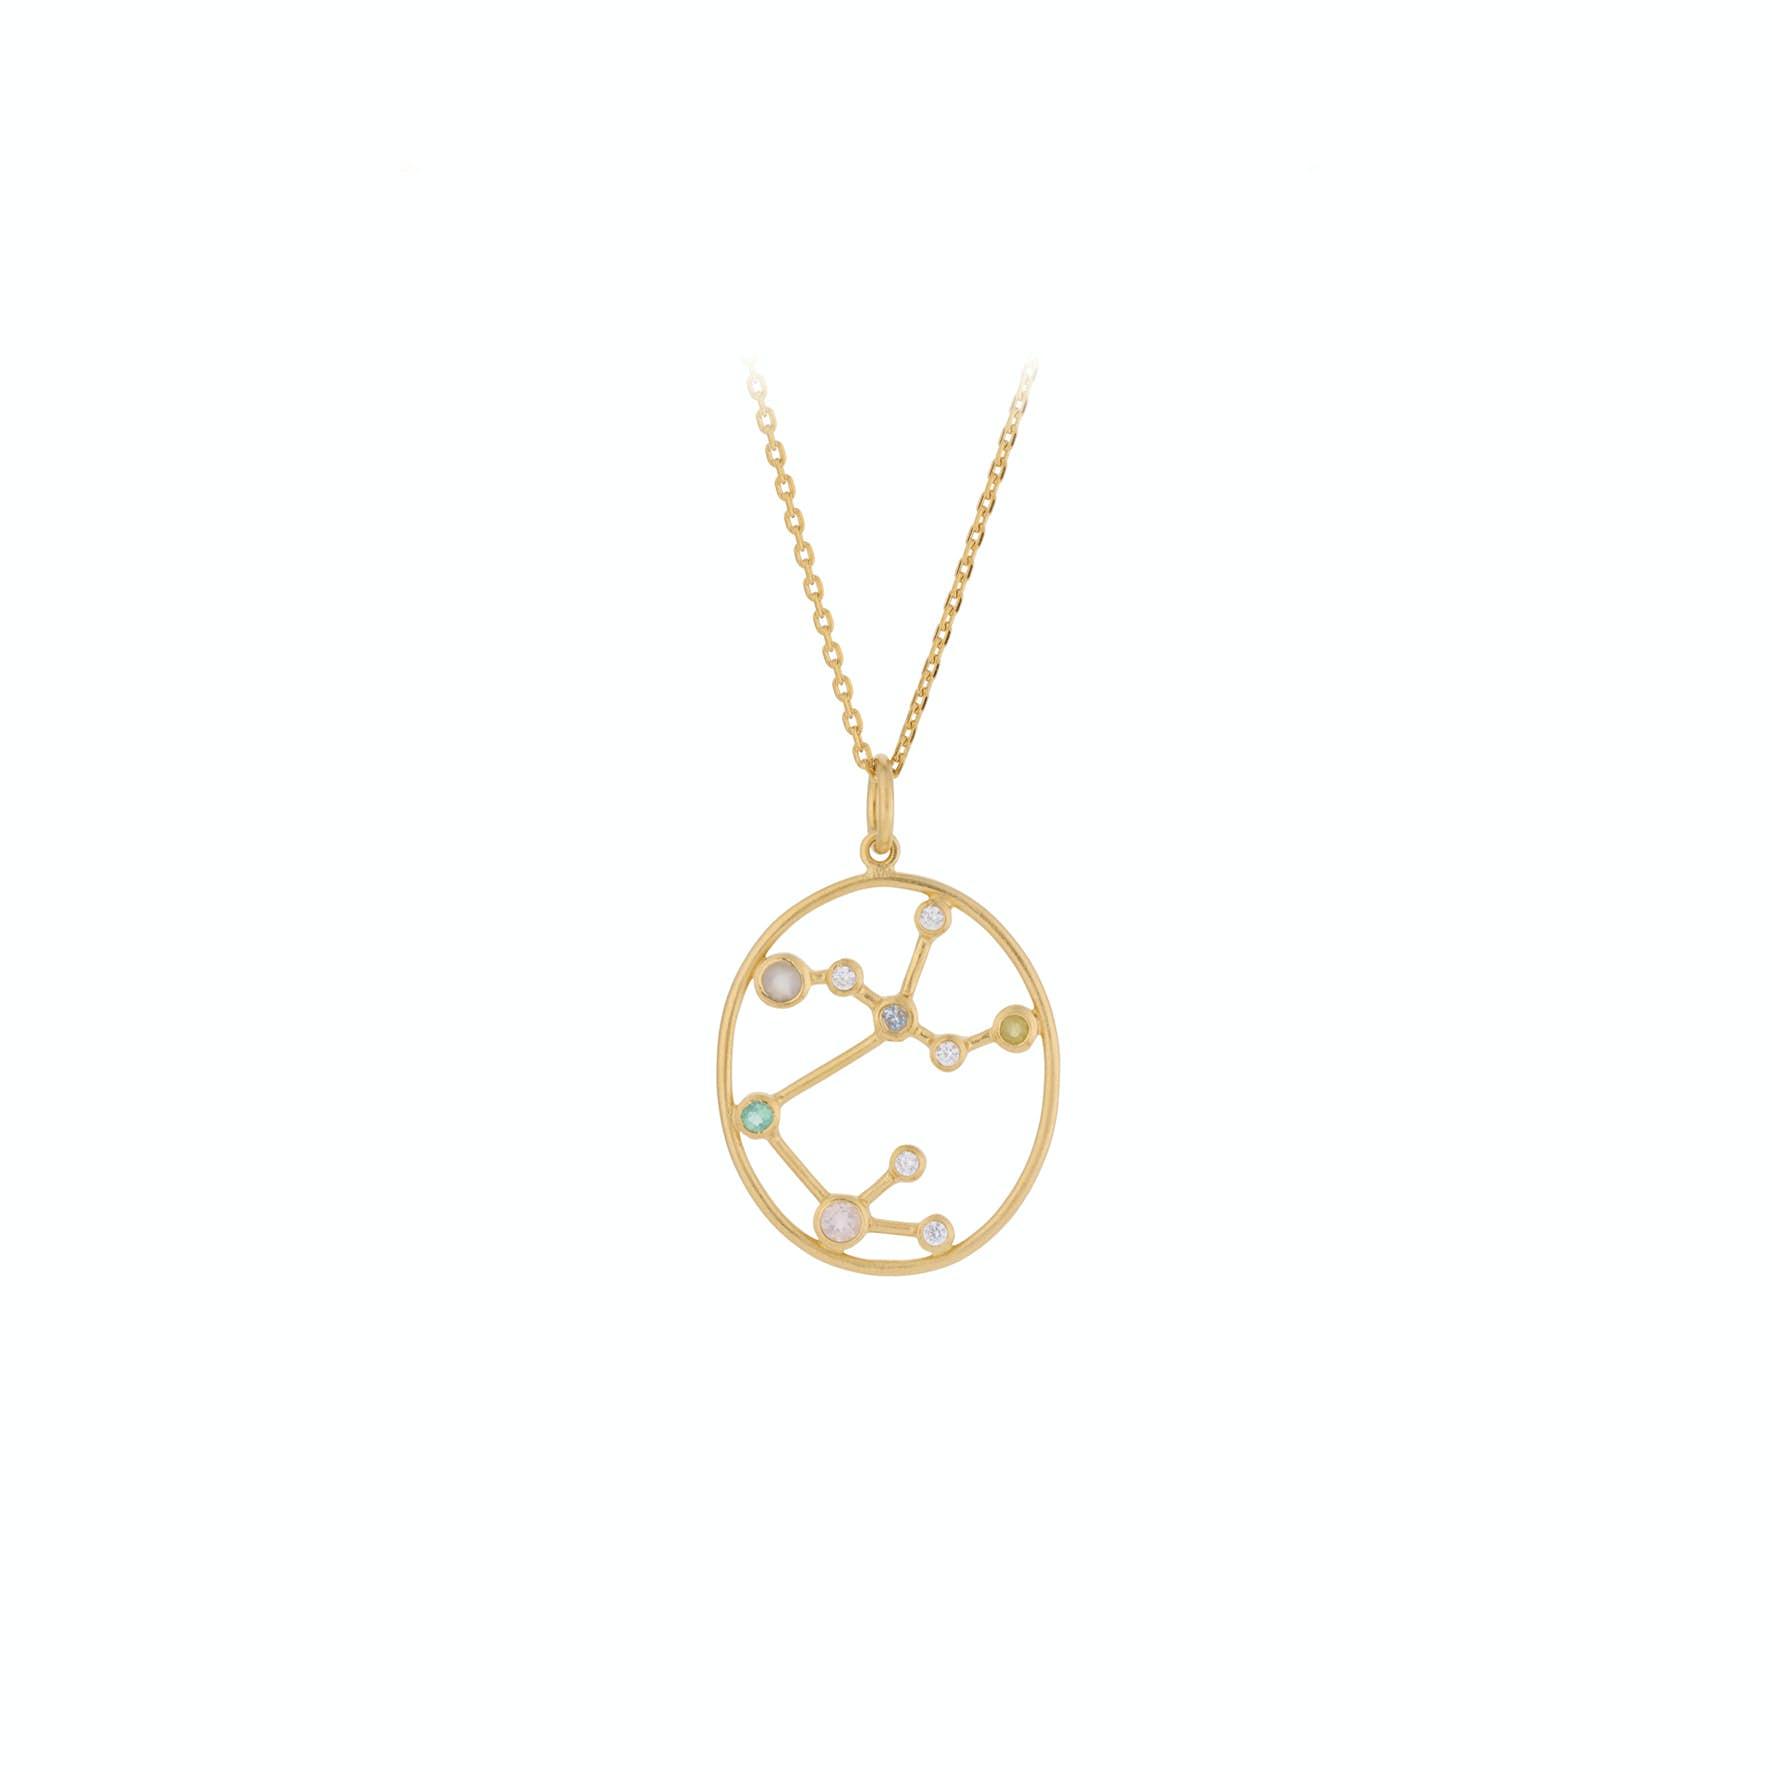 Zodiac Sagittarius Necklace (Nov 23 - Dec 21) von Pernille Corydon in Vergoldet-Silber Sterling 925